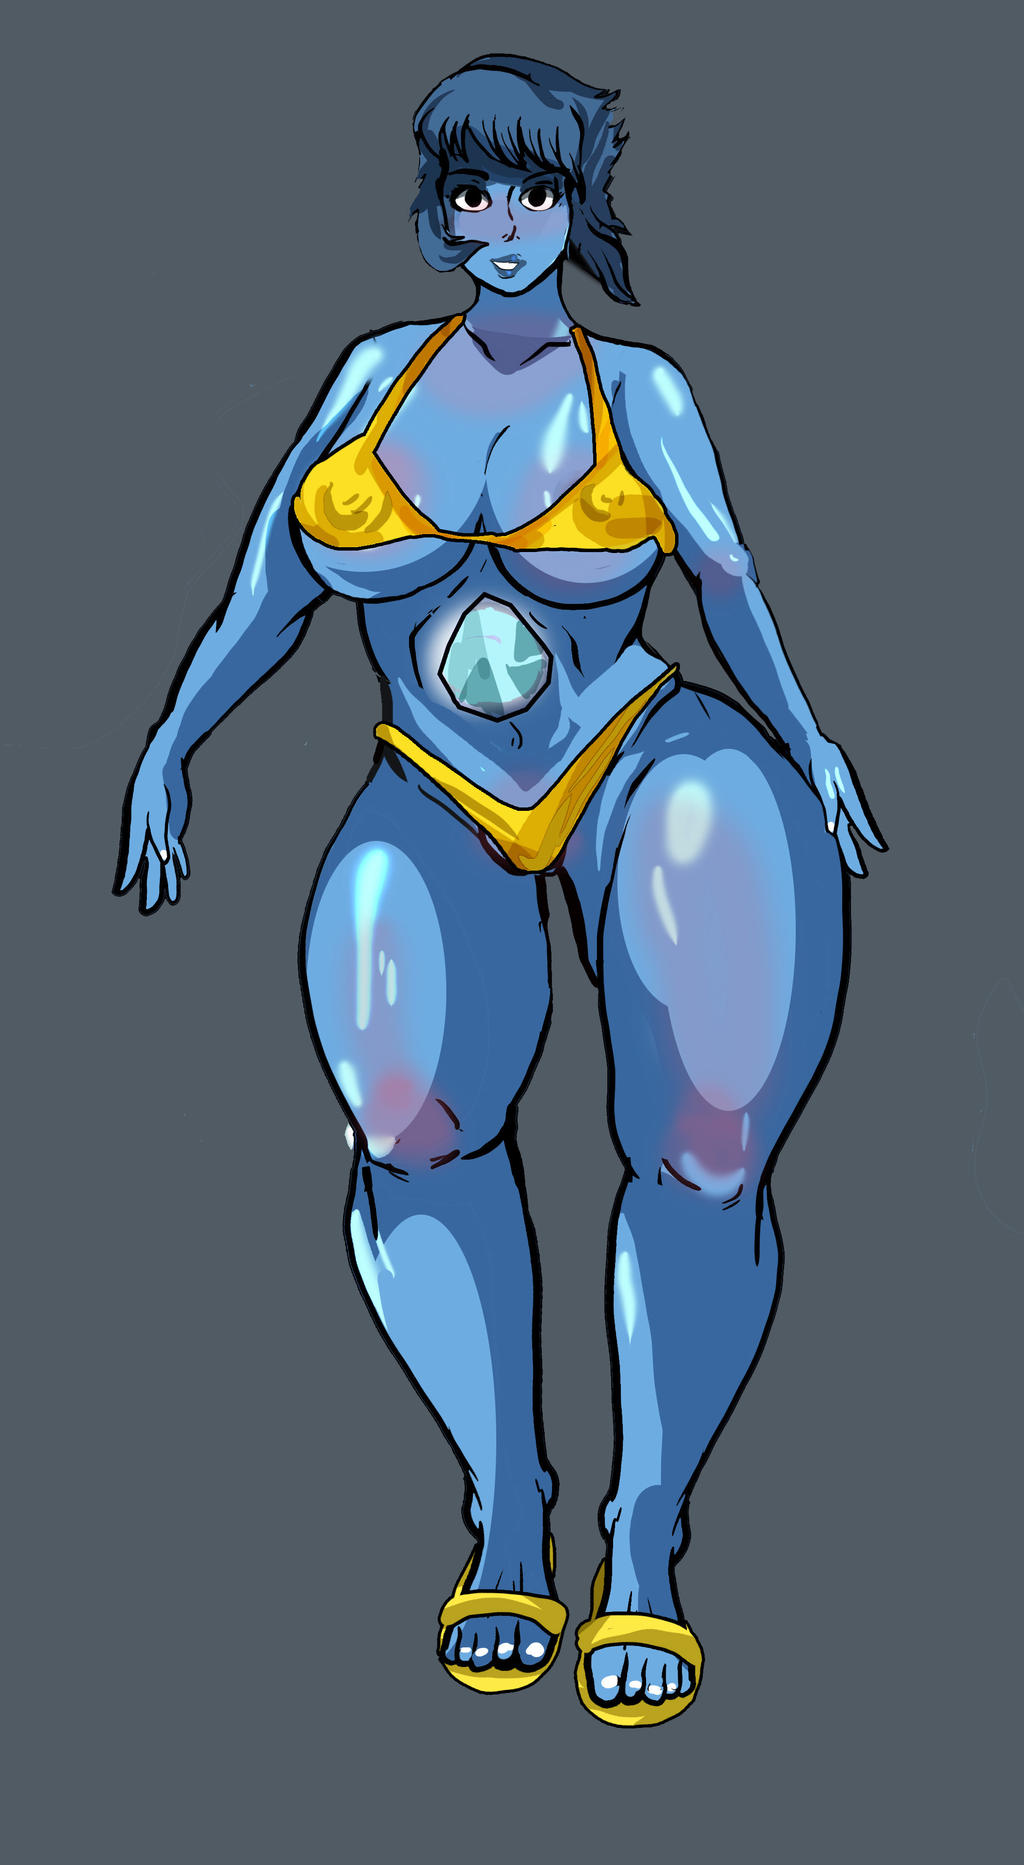 Request Futa Goddess Lazuli By Vogol On Deviantart Watermelon Wallpaper Rainbow Find Free HD for Desktop [freshlhys.tk]